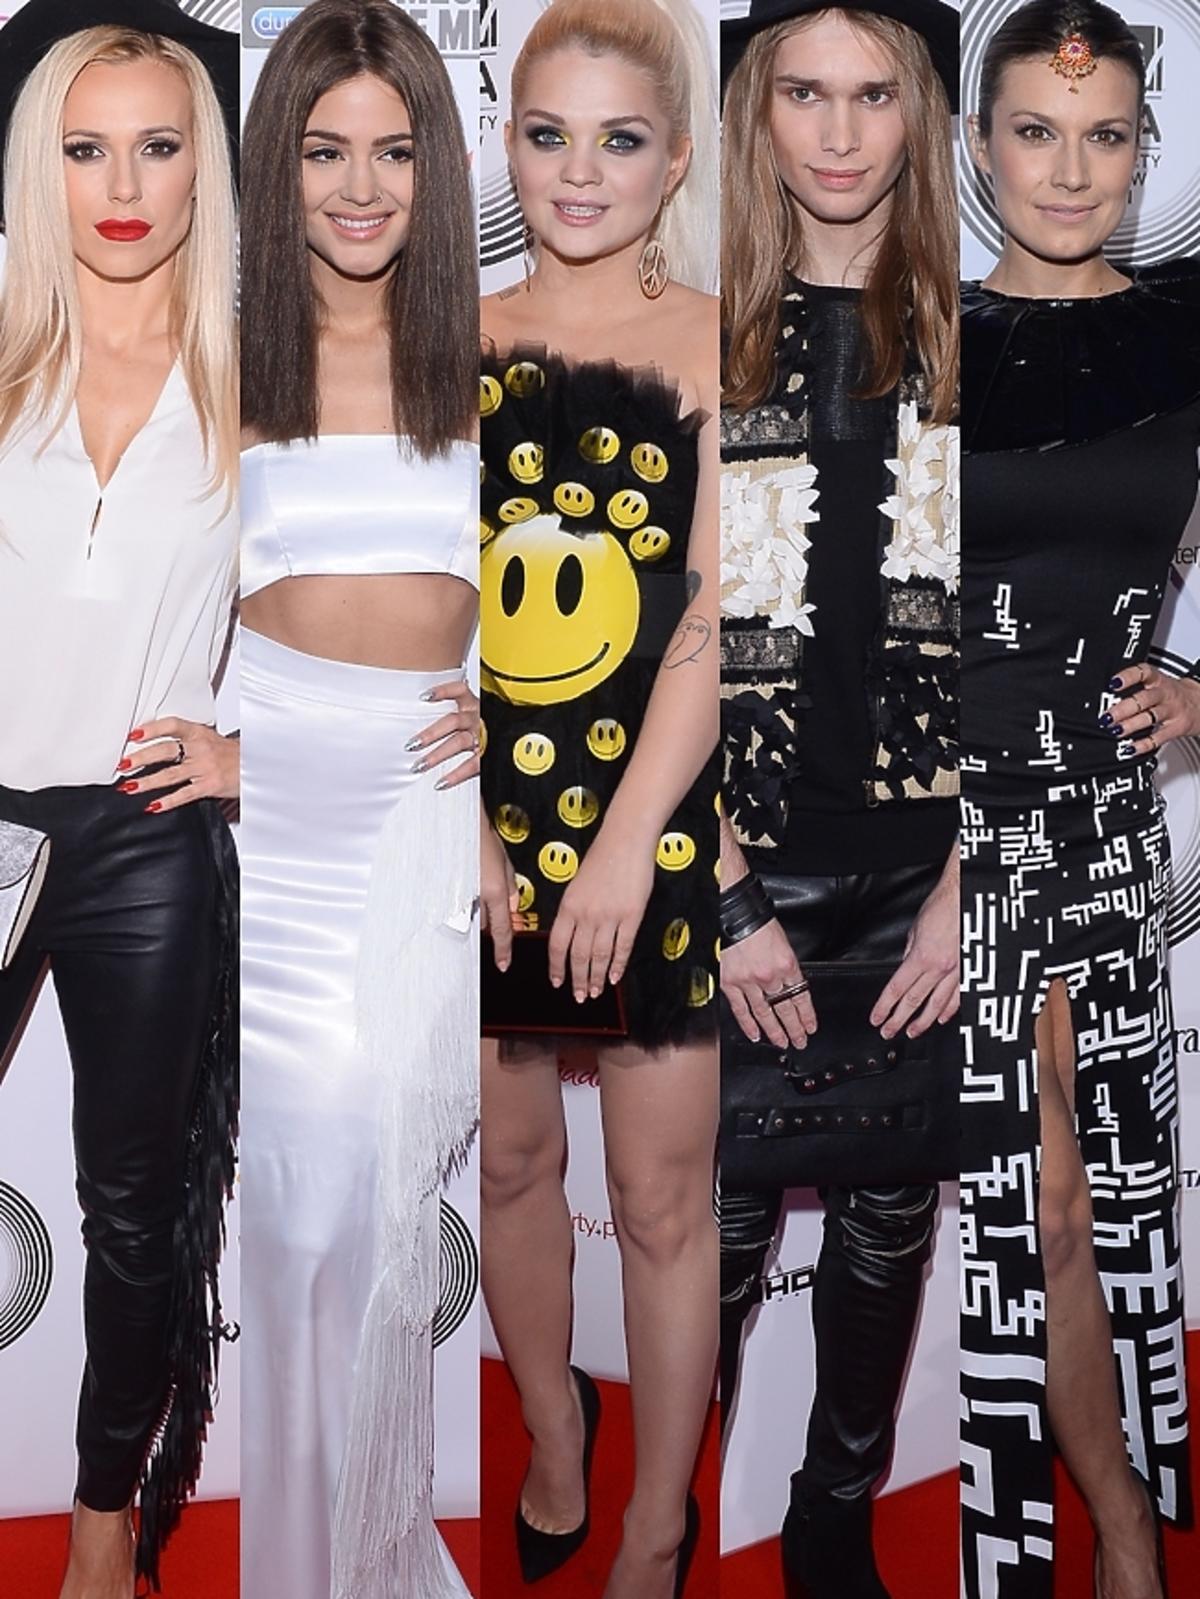 Gwiazdy na MTV EMA Pre-Party 2014